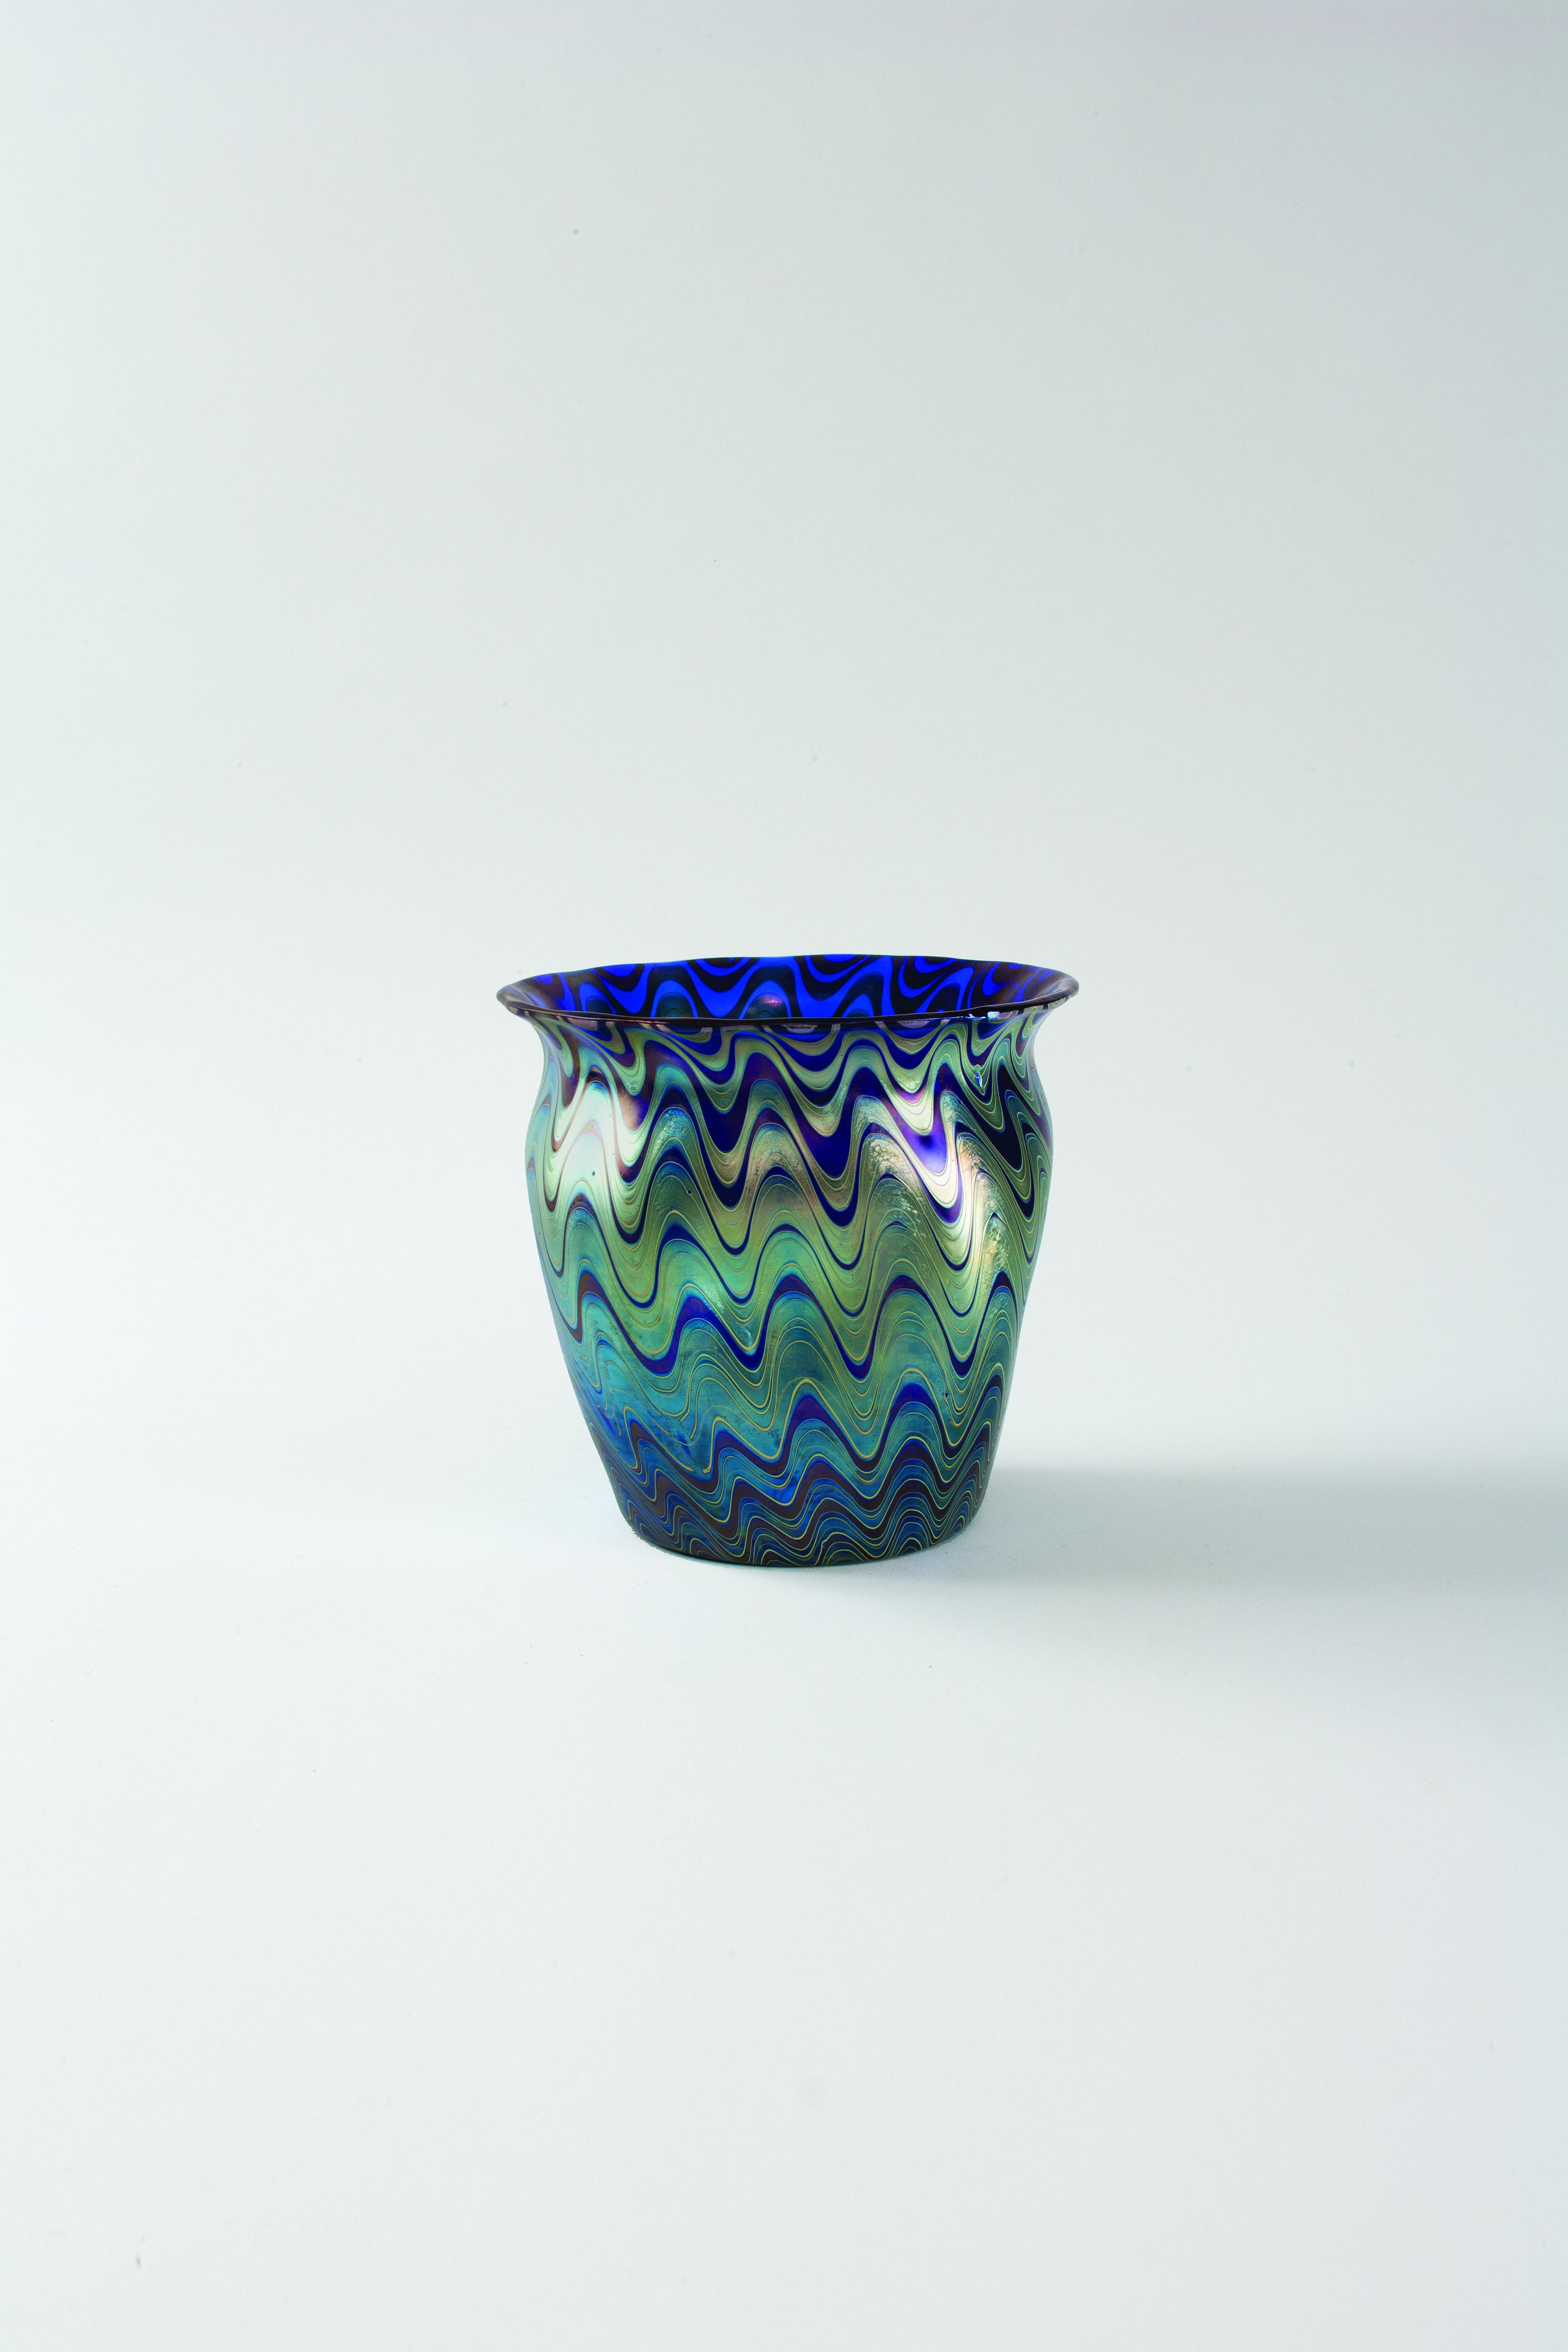 Austrian art nouveau glass vase by loetz an austrian jugendstil austrian art nouveau glass vase by loetz an austrian jugendstil cobalt colored vase with iridescent reviewsmspy